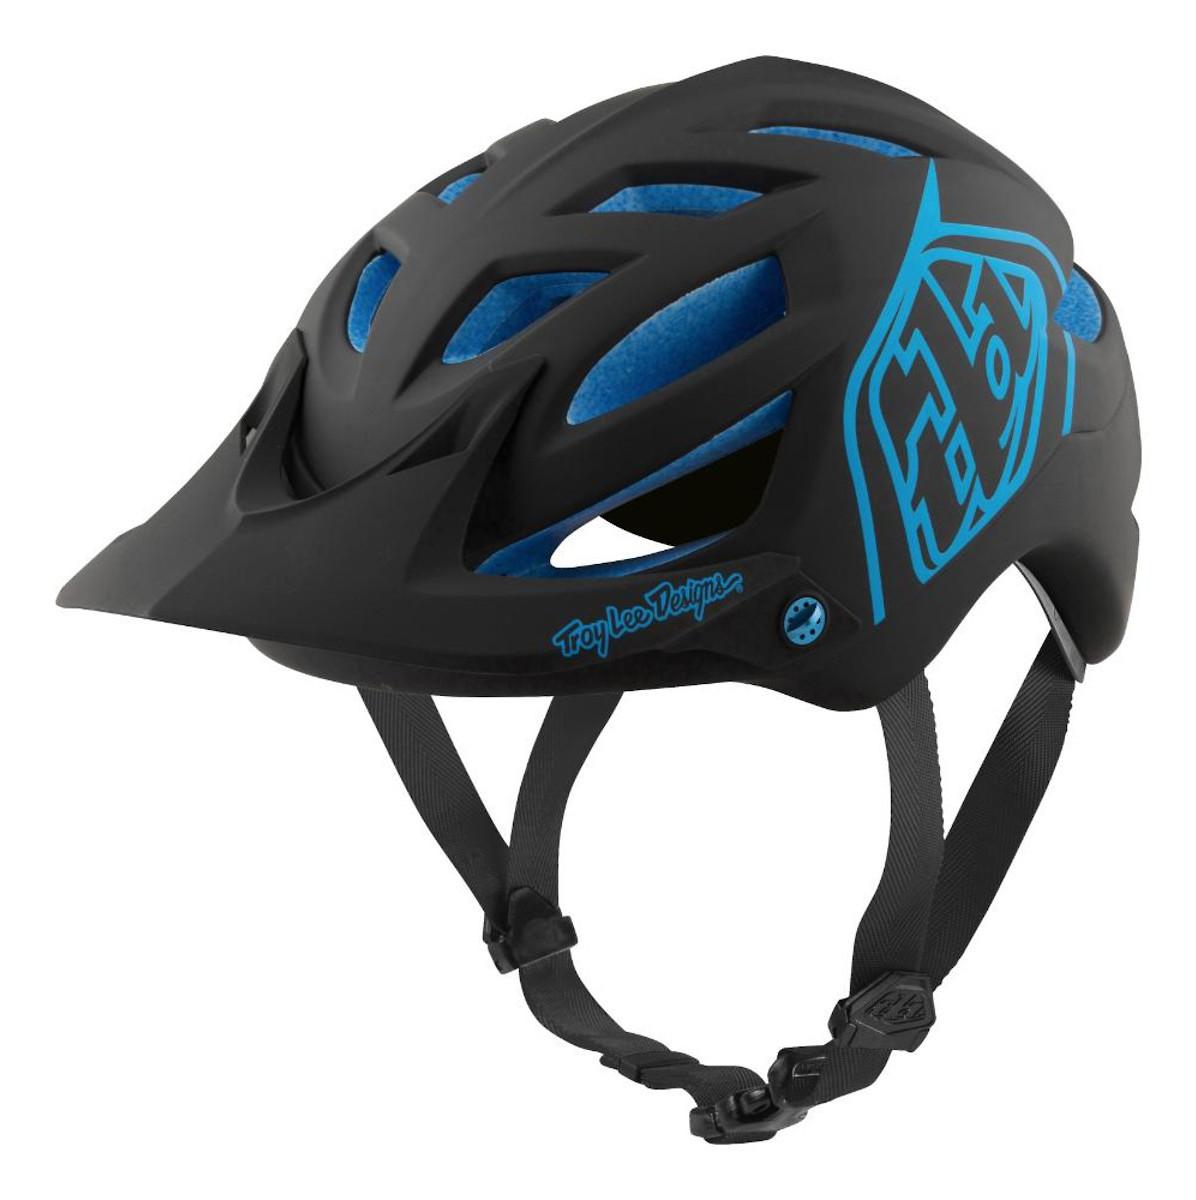 TLD A1 MIPS Helmet - 2018 Classic Black/Blue